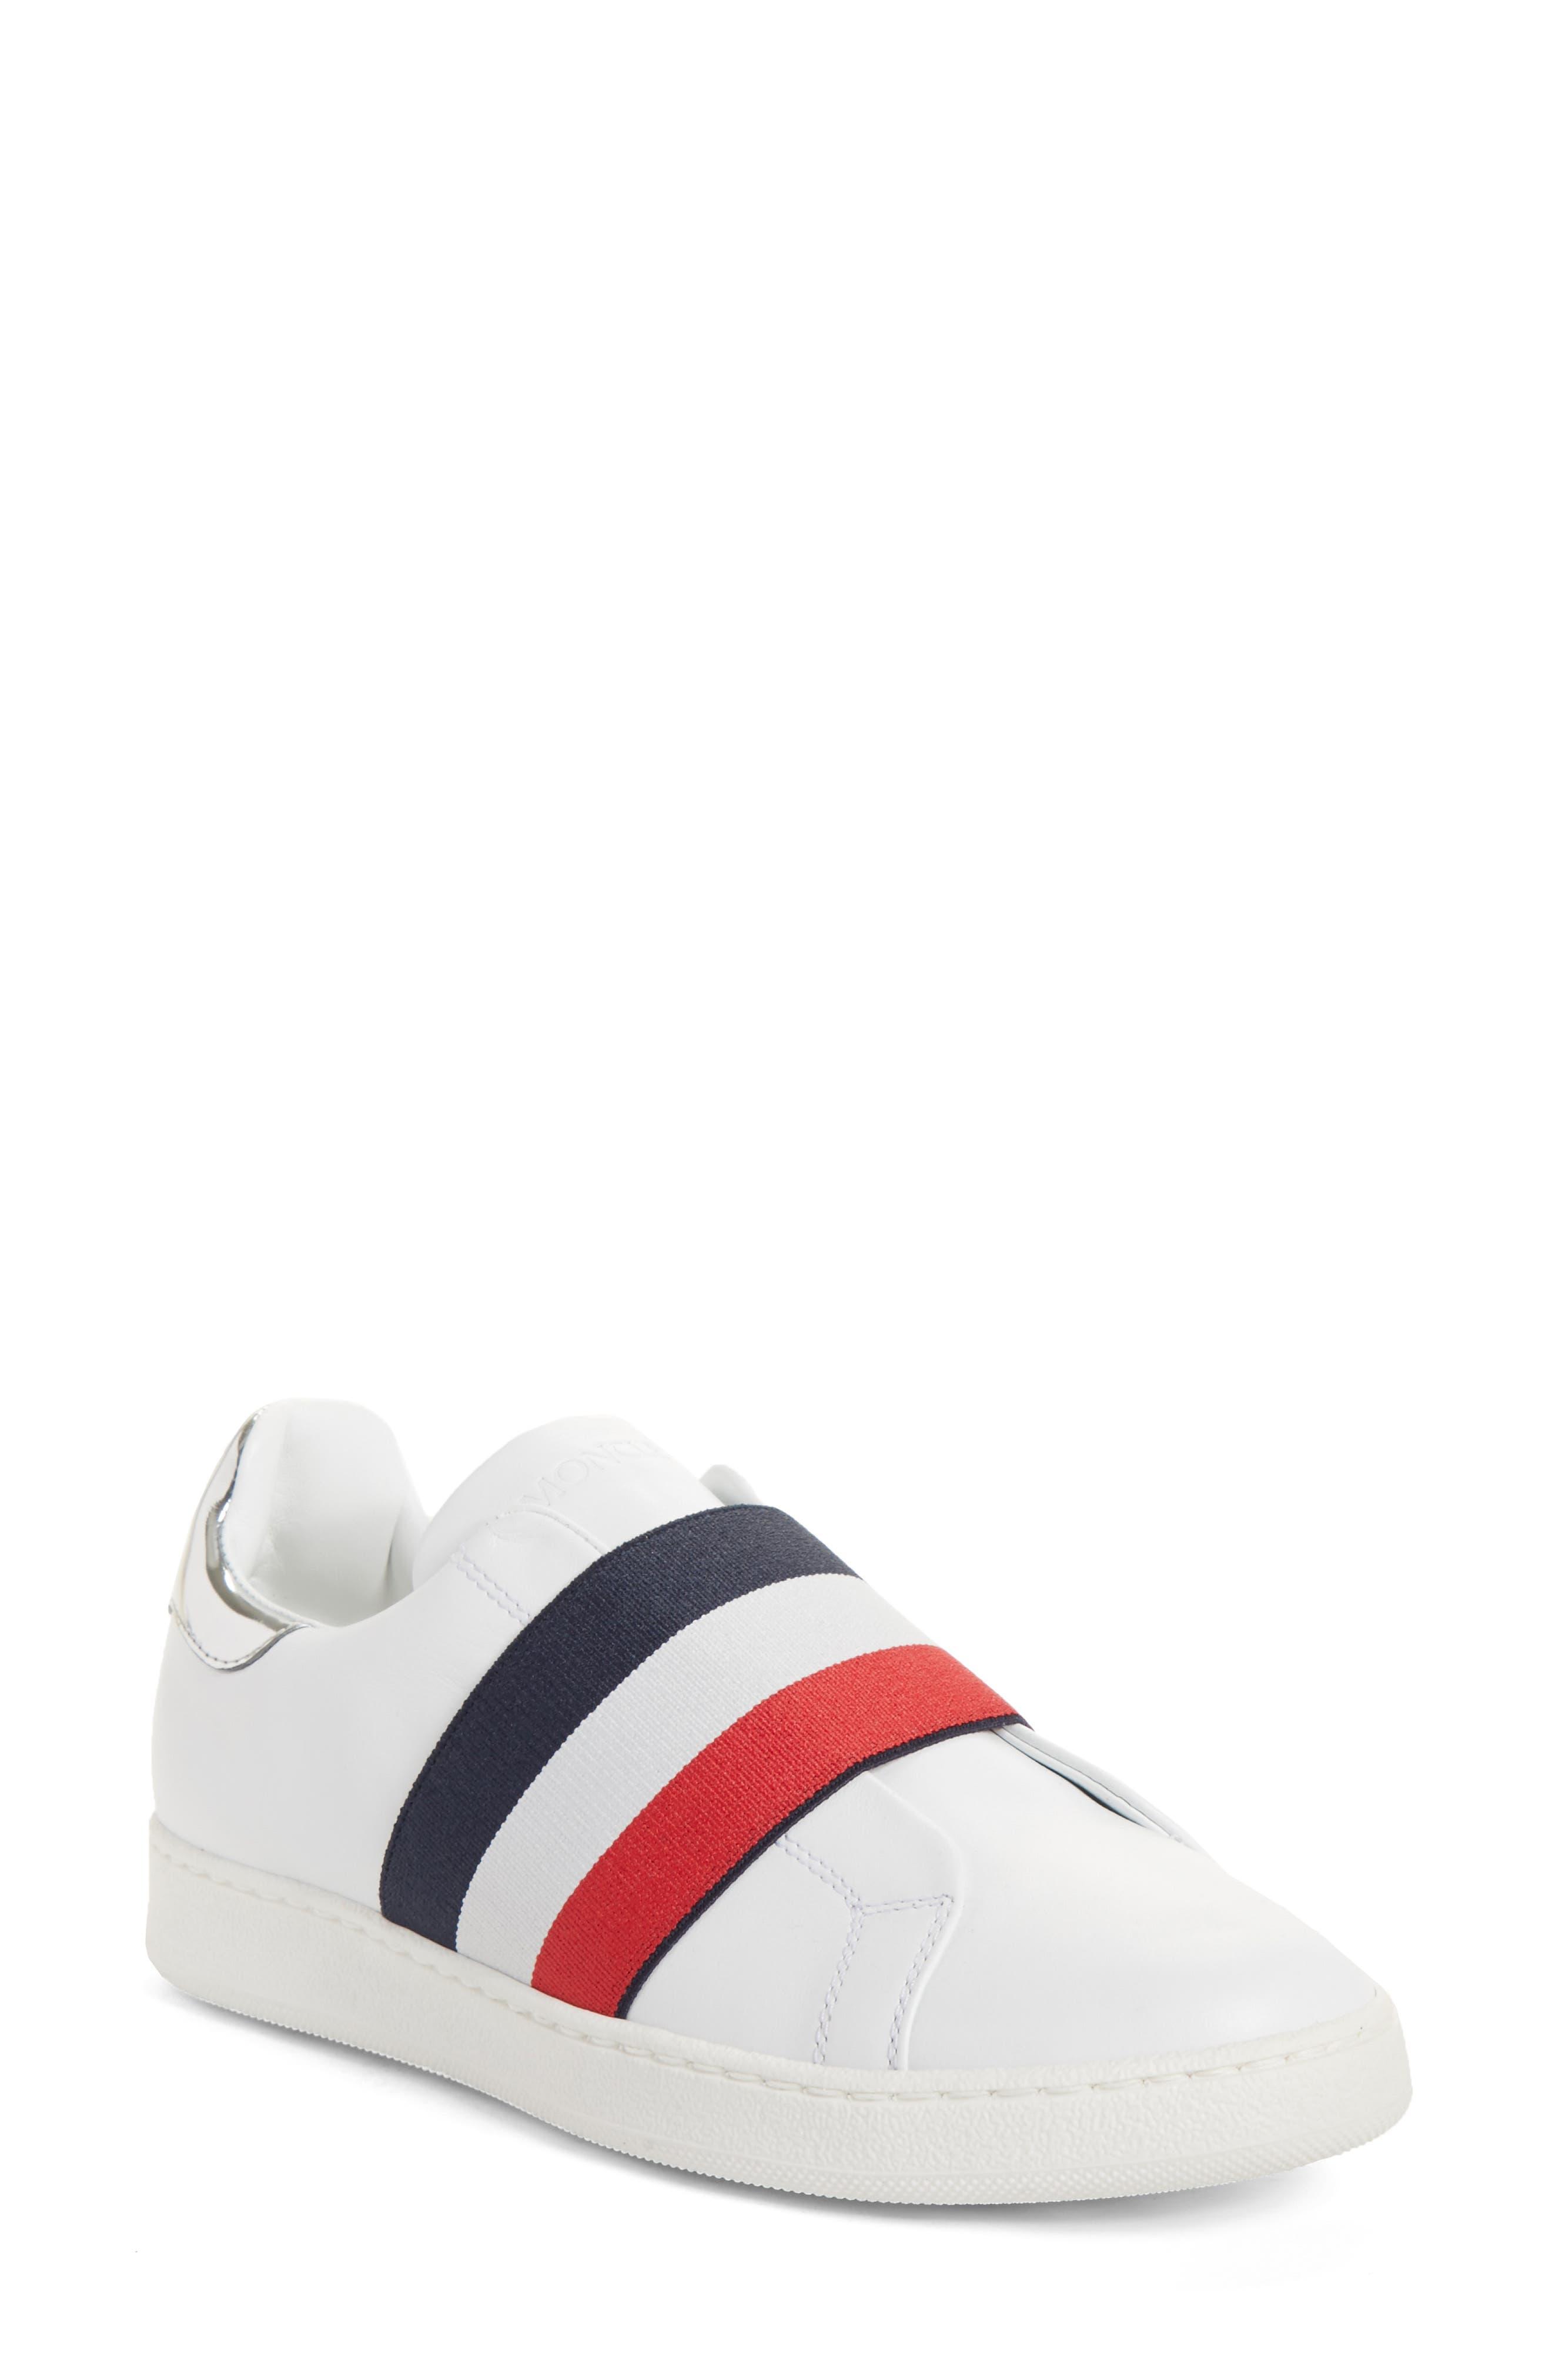 Alizee Low Top Sneaker,                             Main thumbnail 1, color,                             100